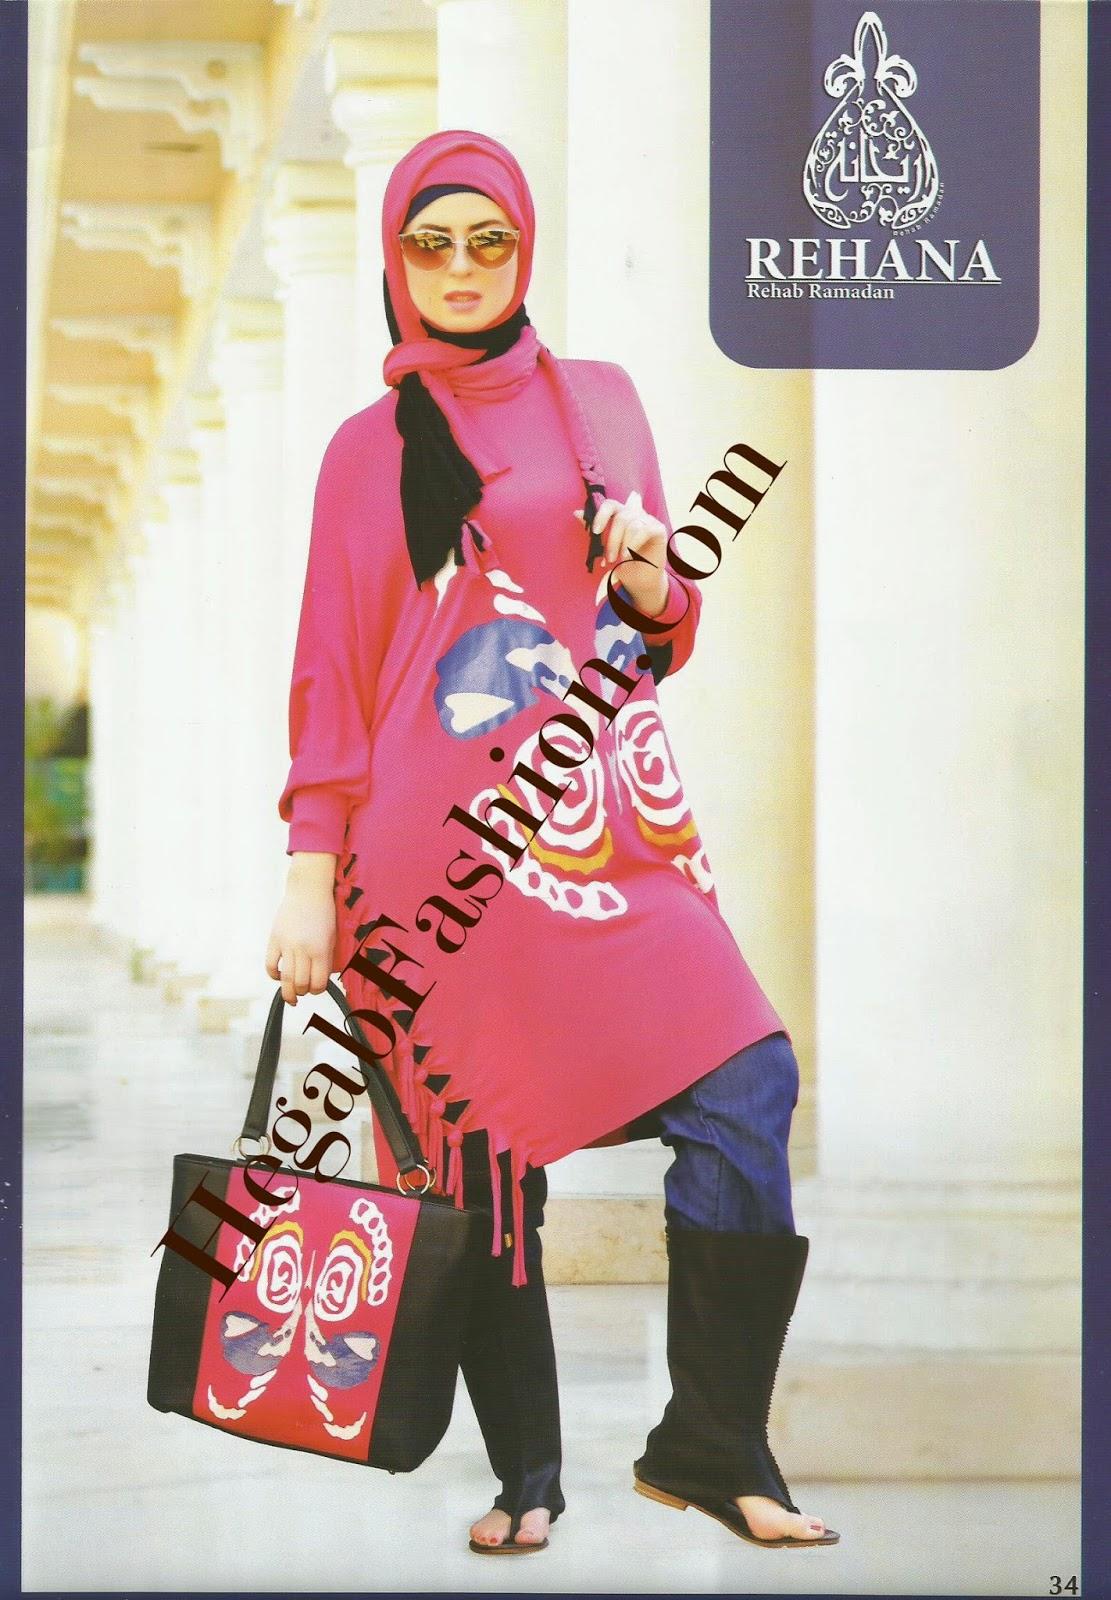 dbda5ee8daa4c مجلة حجاب فاشون - Hijab Fashion Magazine  أزياء ريحانه REHANA - مجلة ...